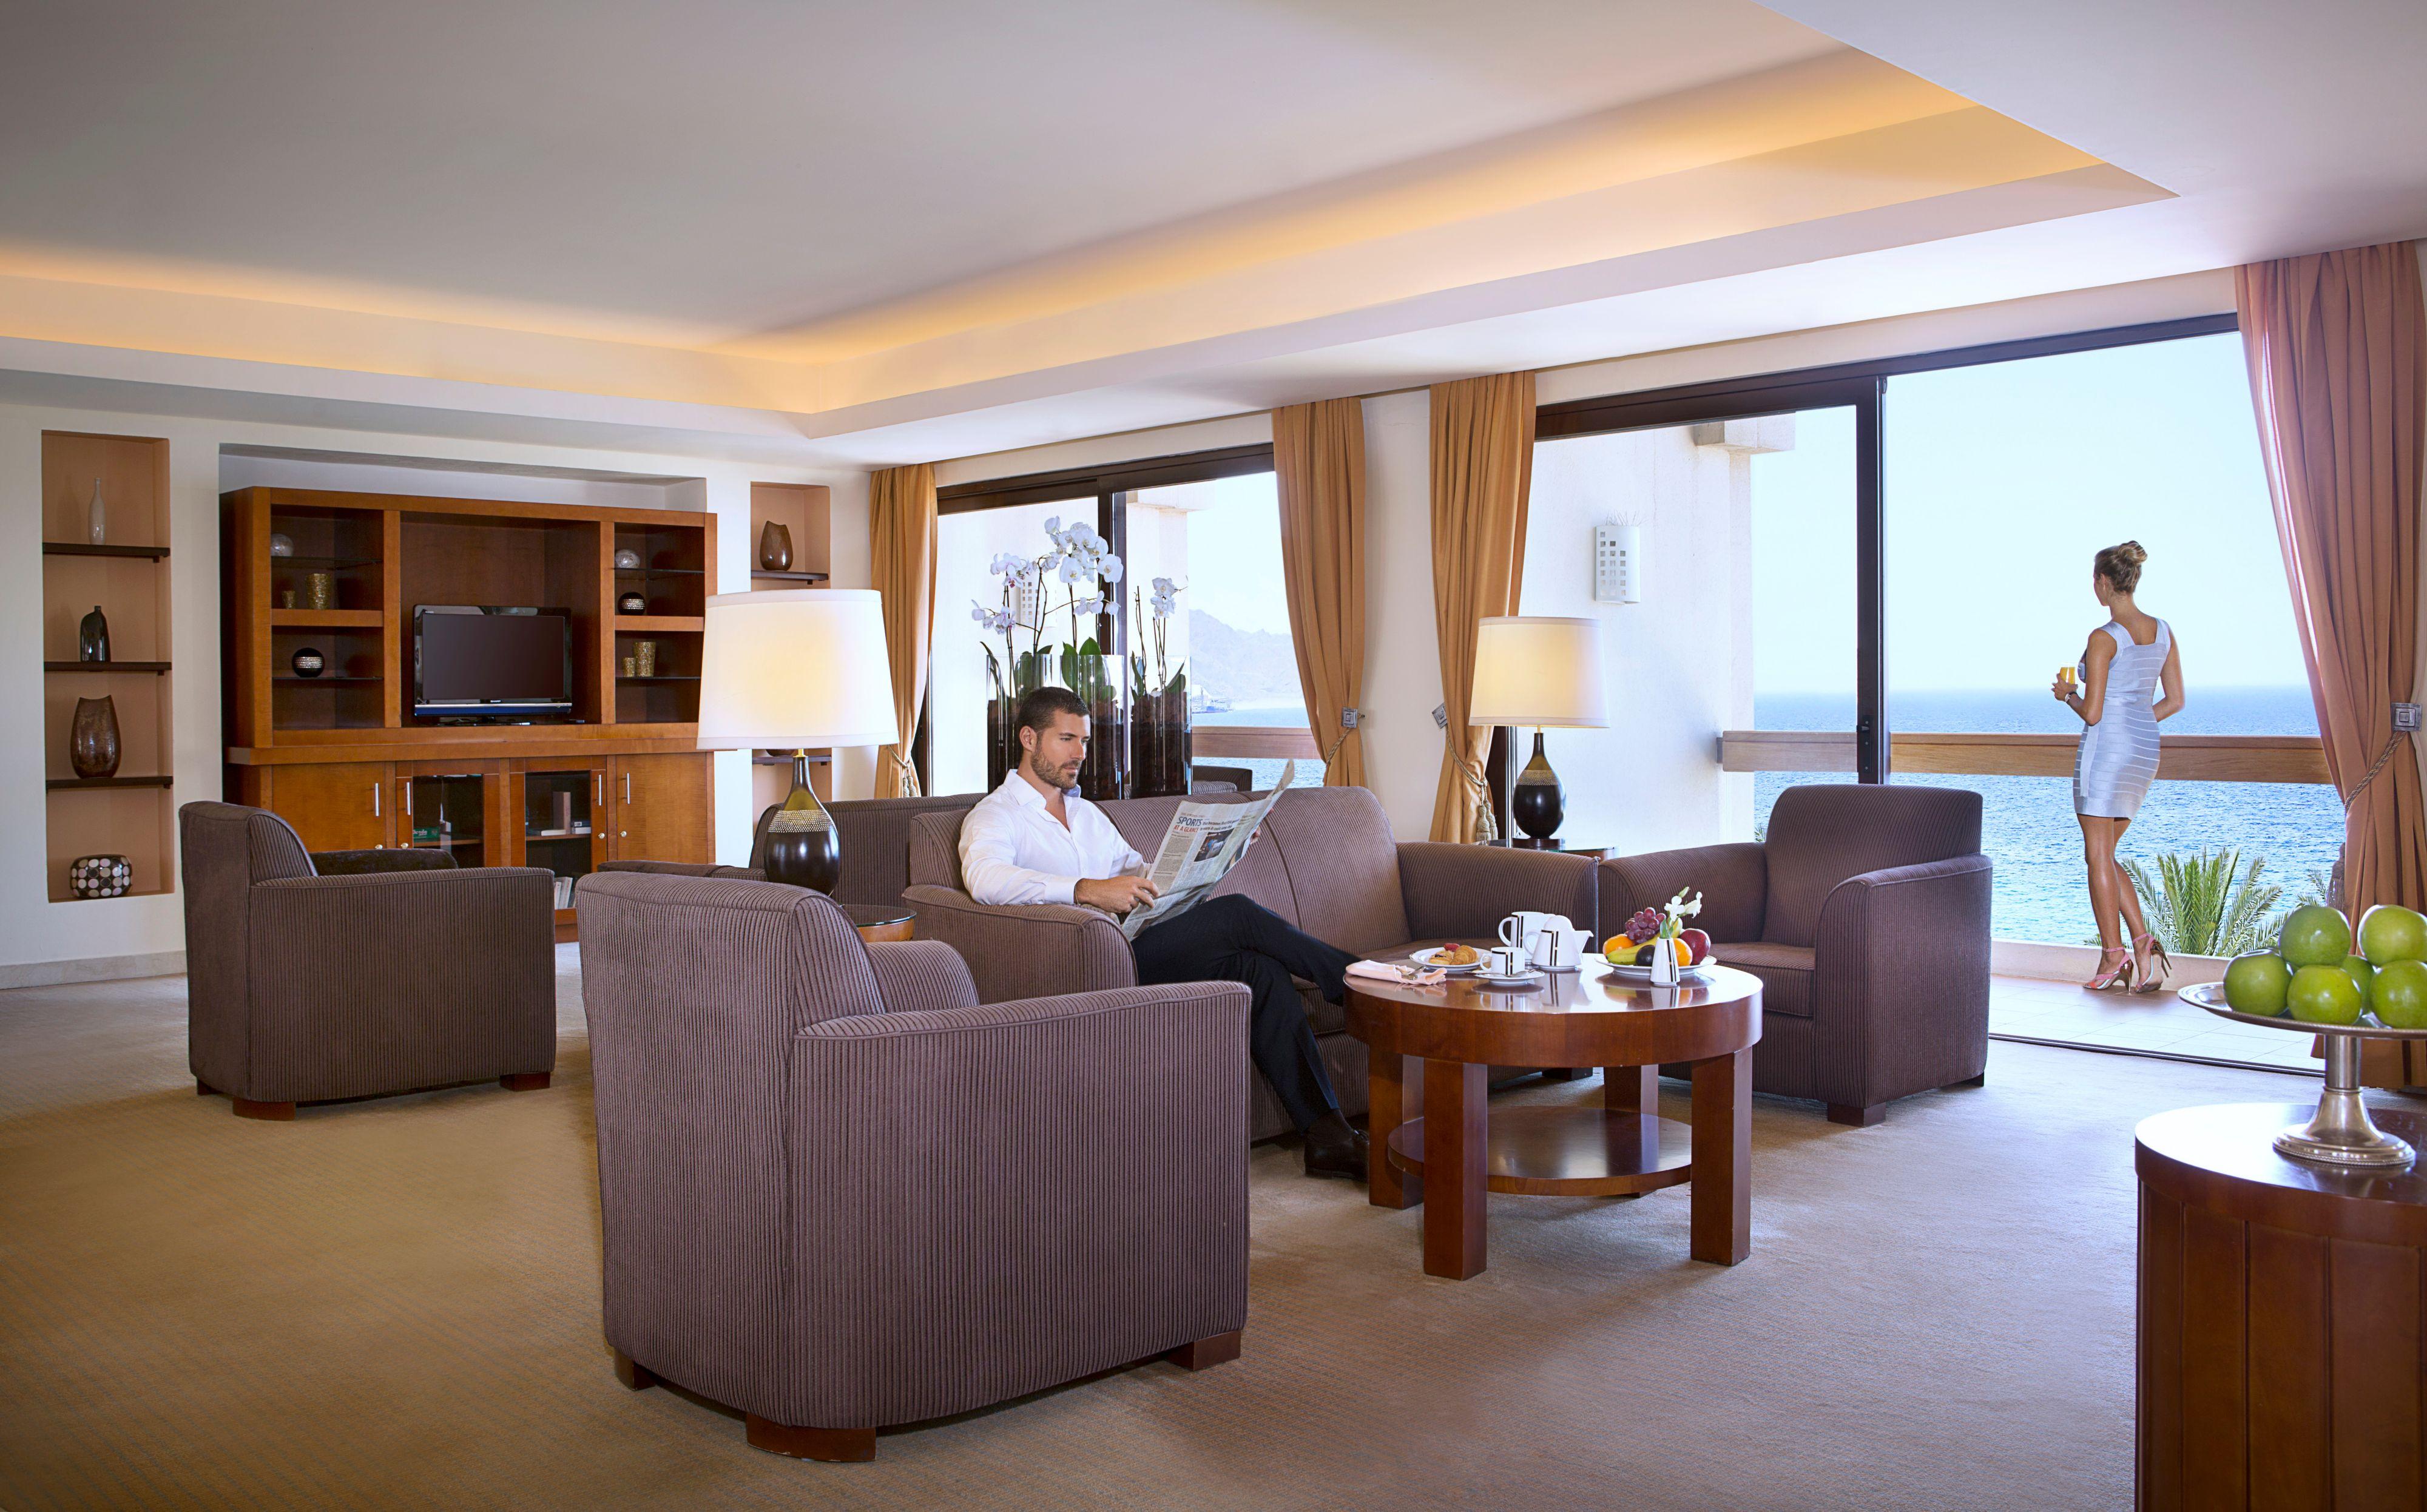 InterContinental Aqaba (Resort Aqaba)